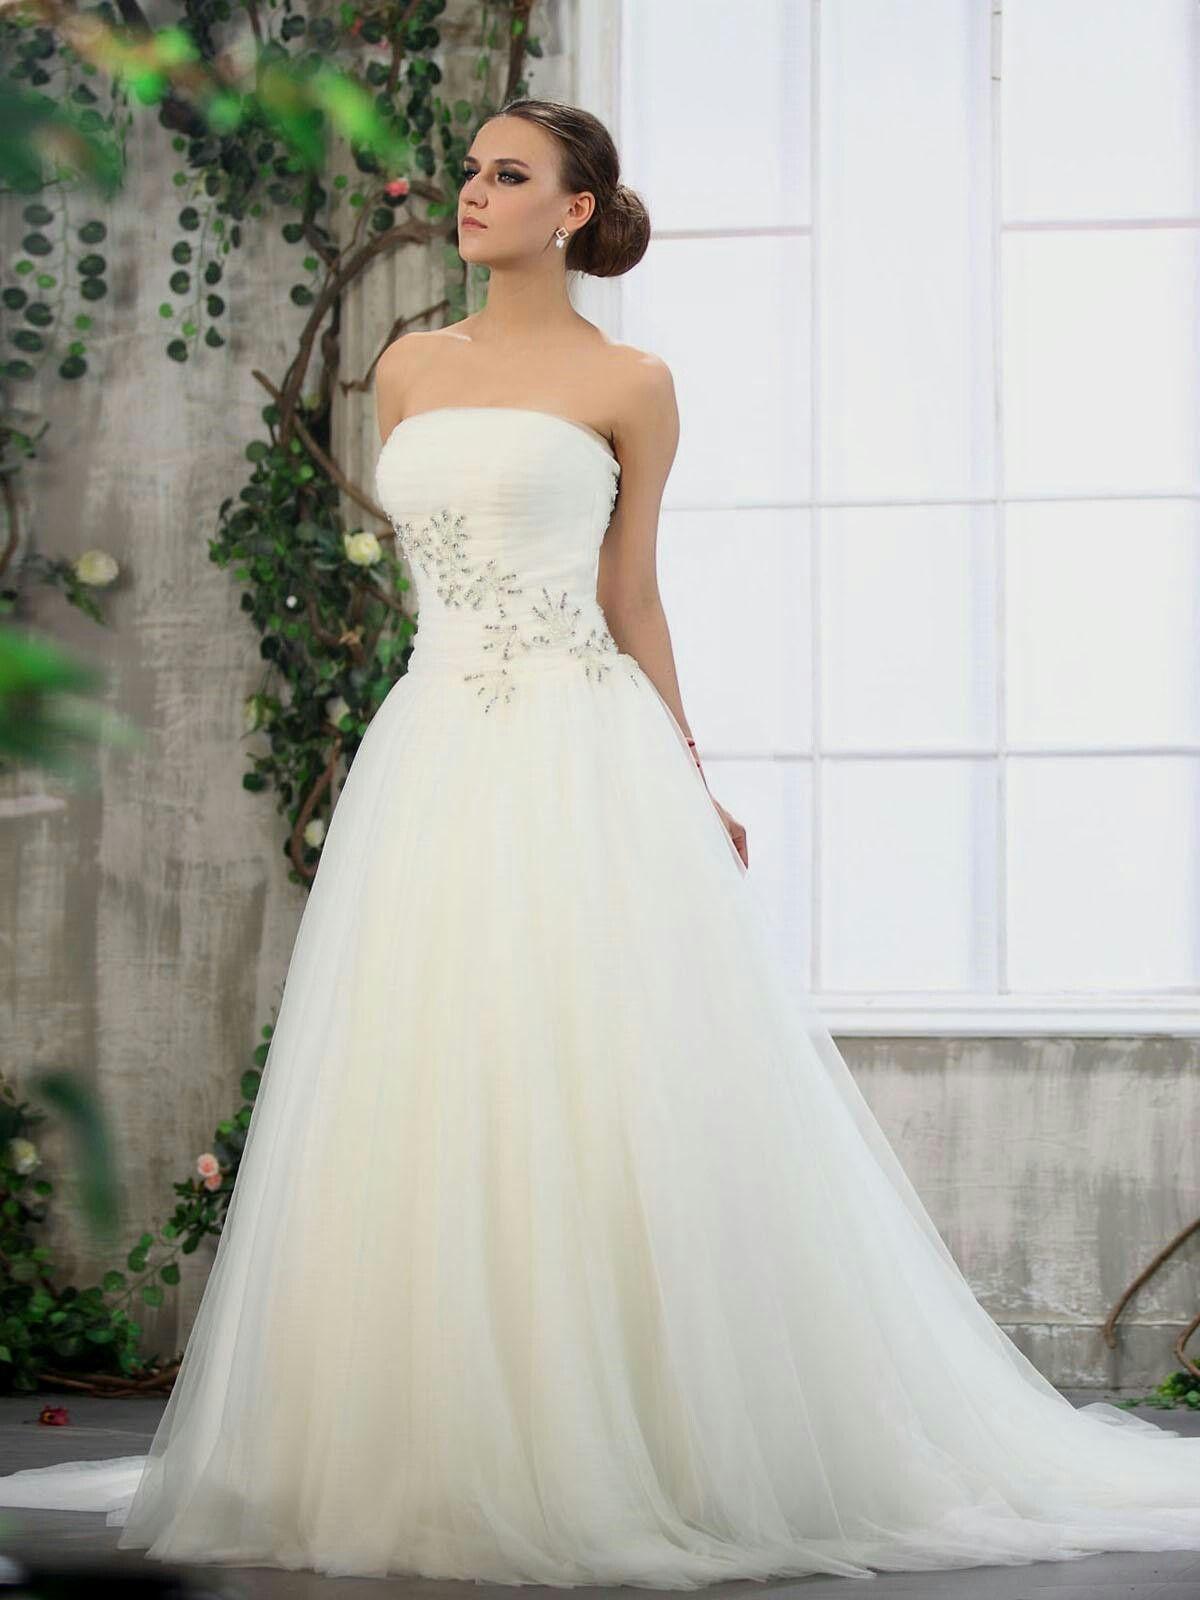 58f242122f64 Elegant 2015 Mermaid Beach Wedding Dresses With Sweetheart Lace-up ...